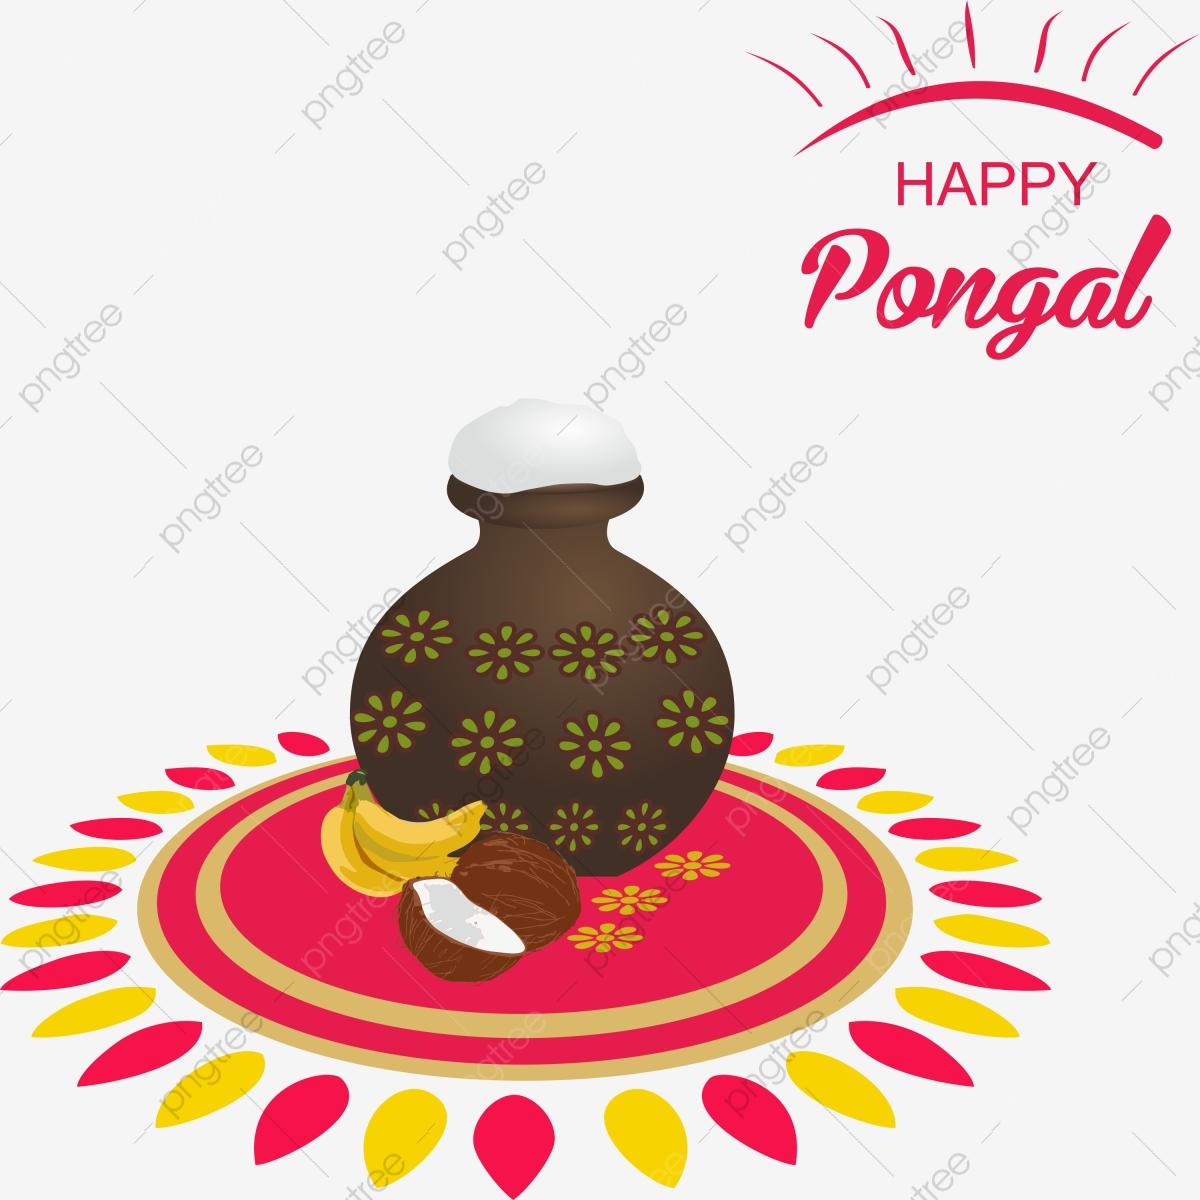 Happy Pongal, Pongal, Pongal Festival, Thai Pongal PNG Transparent.